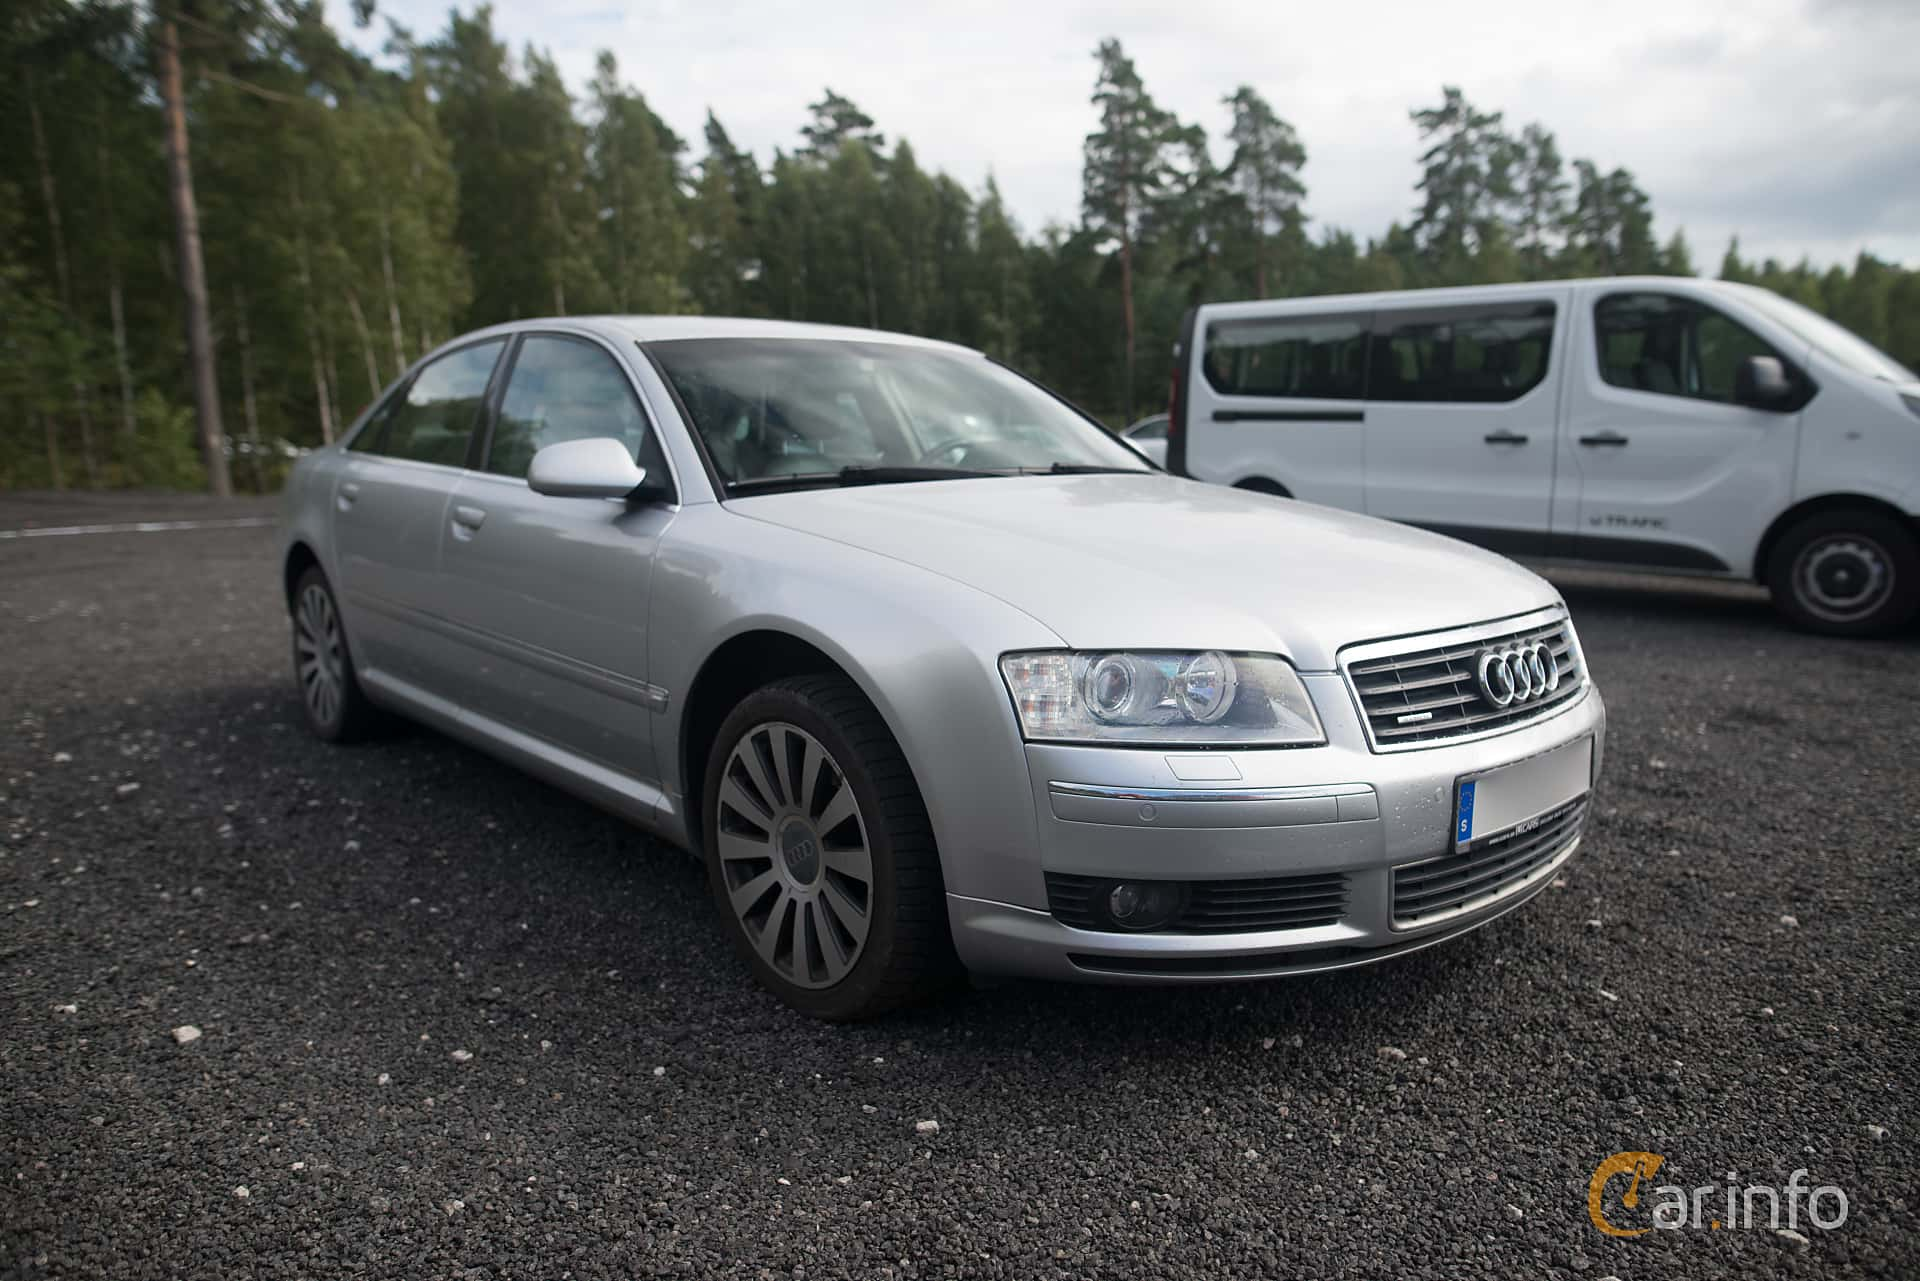 Audi A V Quattro D - Audi car owners database